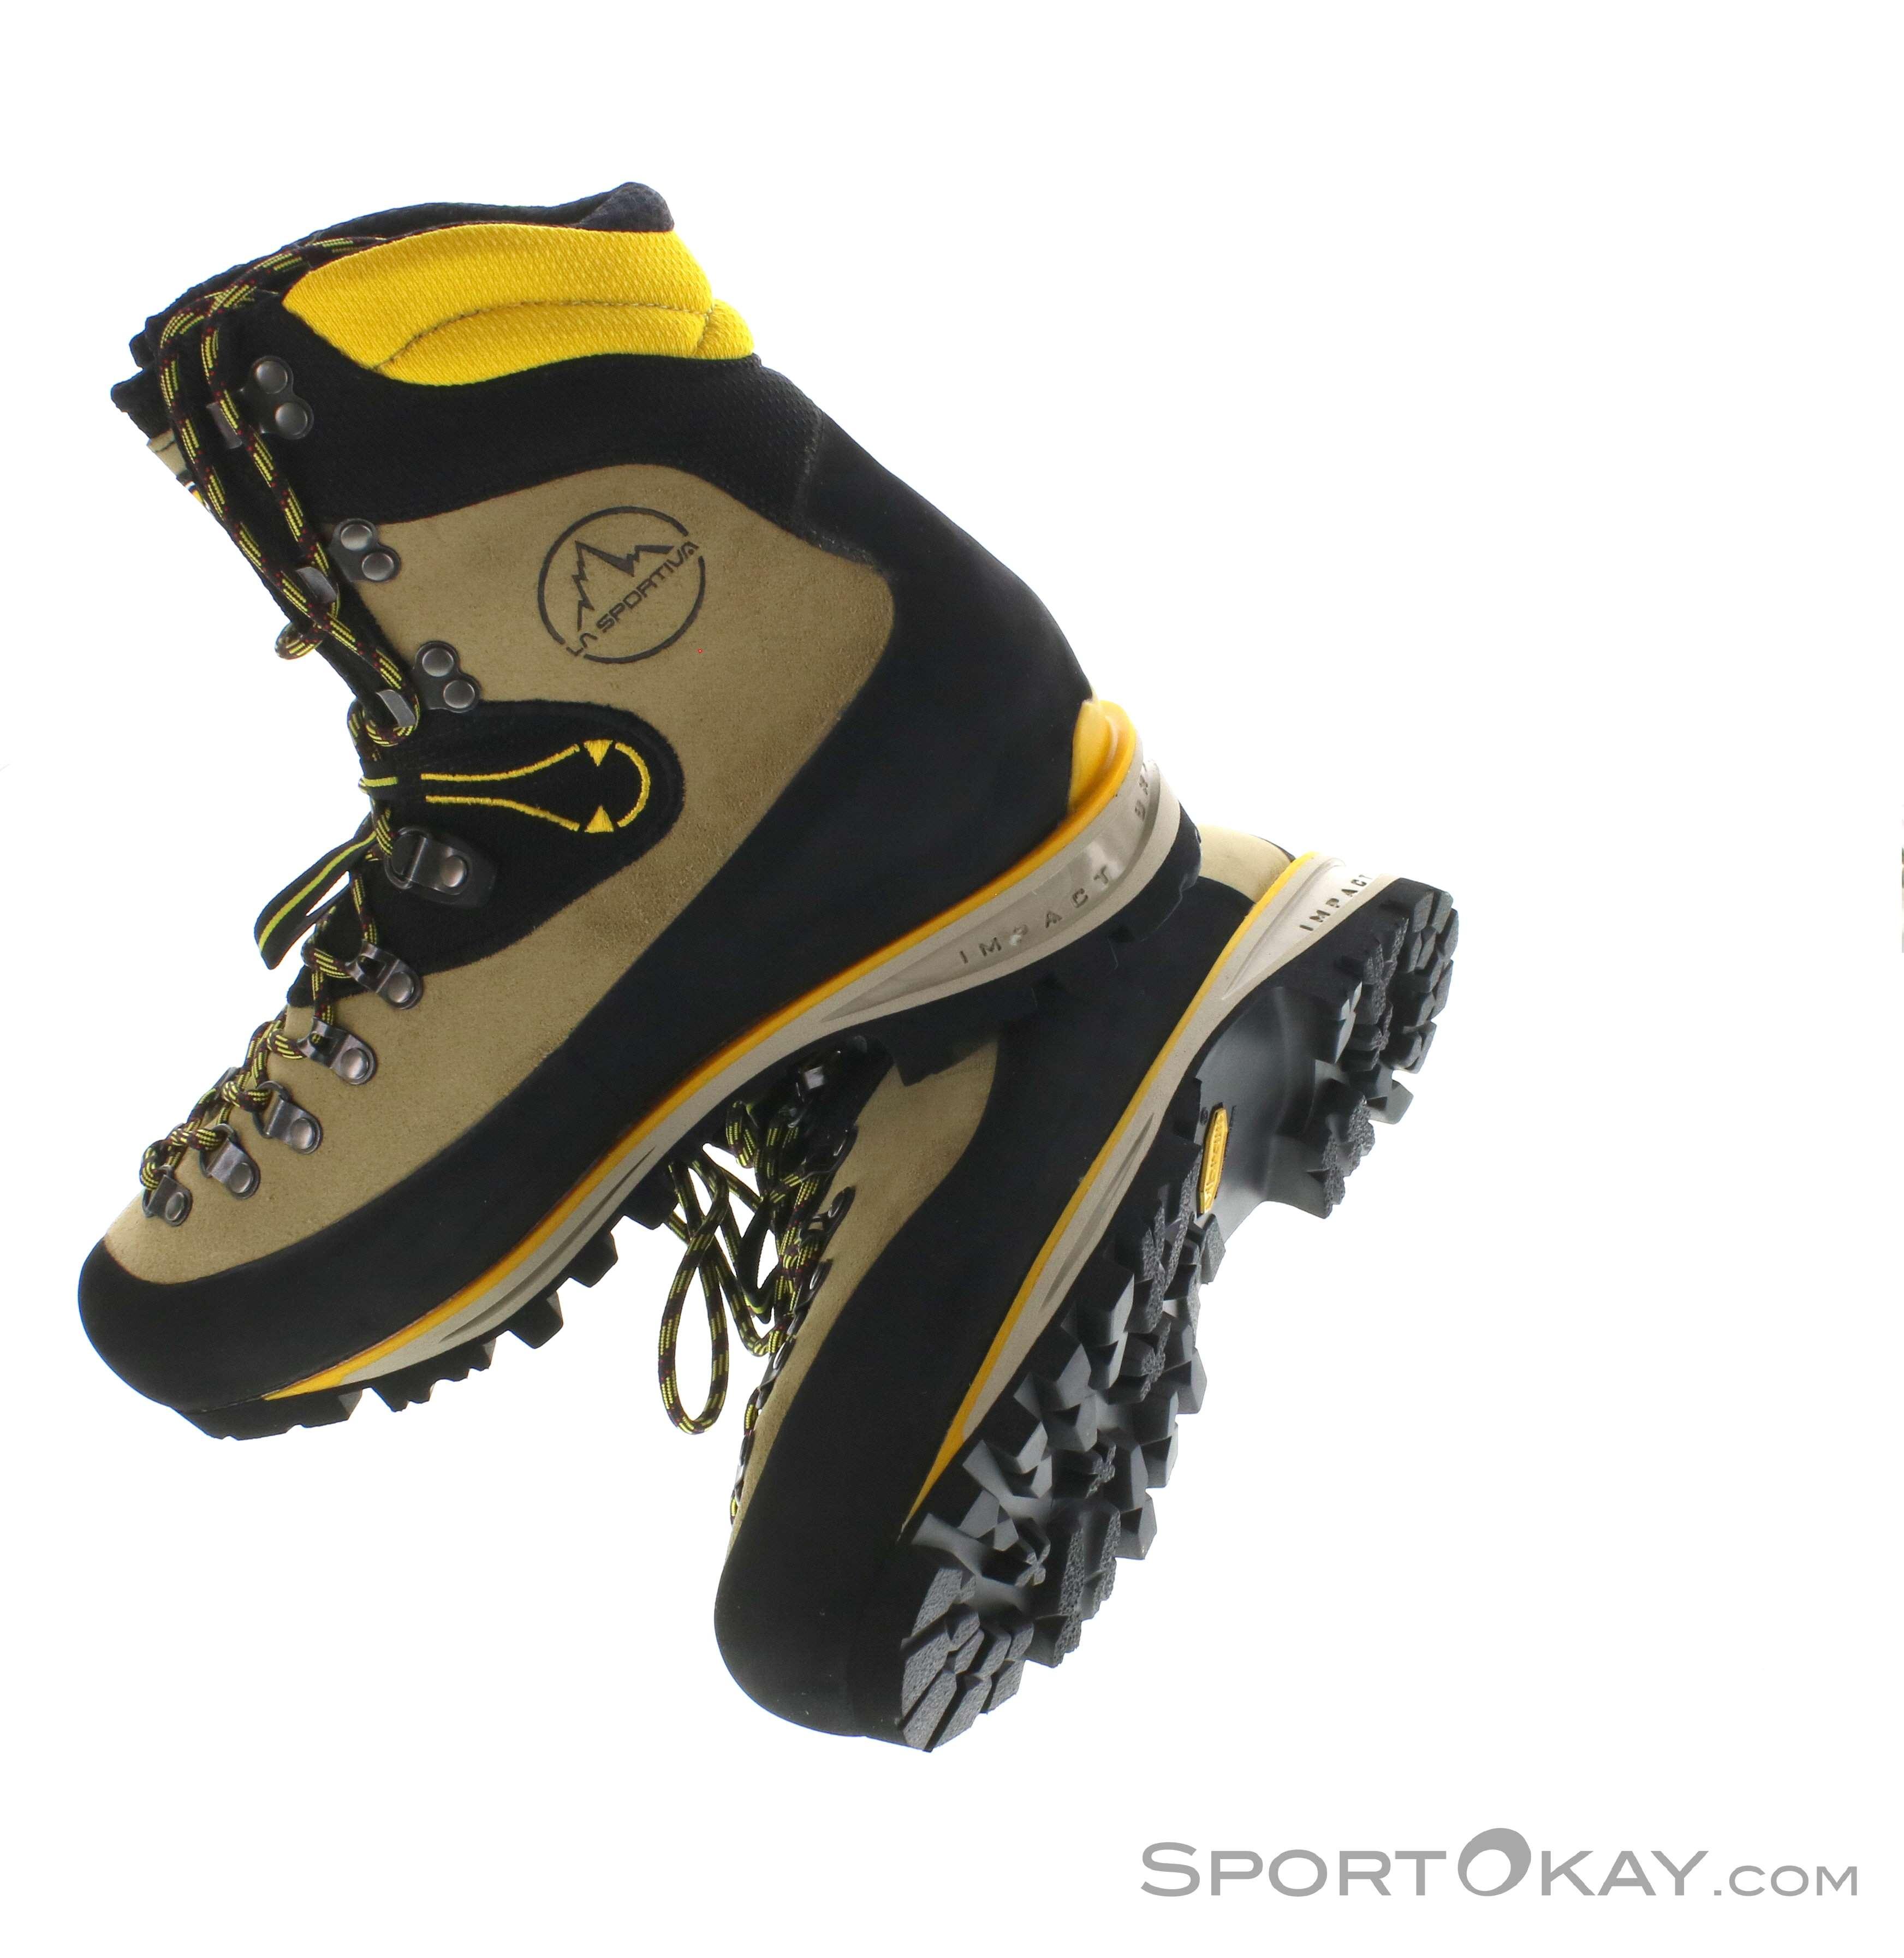 791444a18f99b La Sportiva Nepal Trek EVO Scarpe da Montagna Gore-Tex - Scarpe da ...